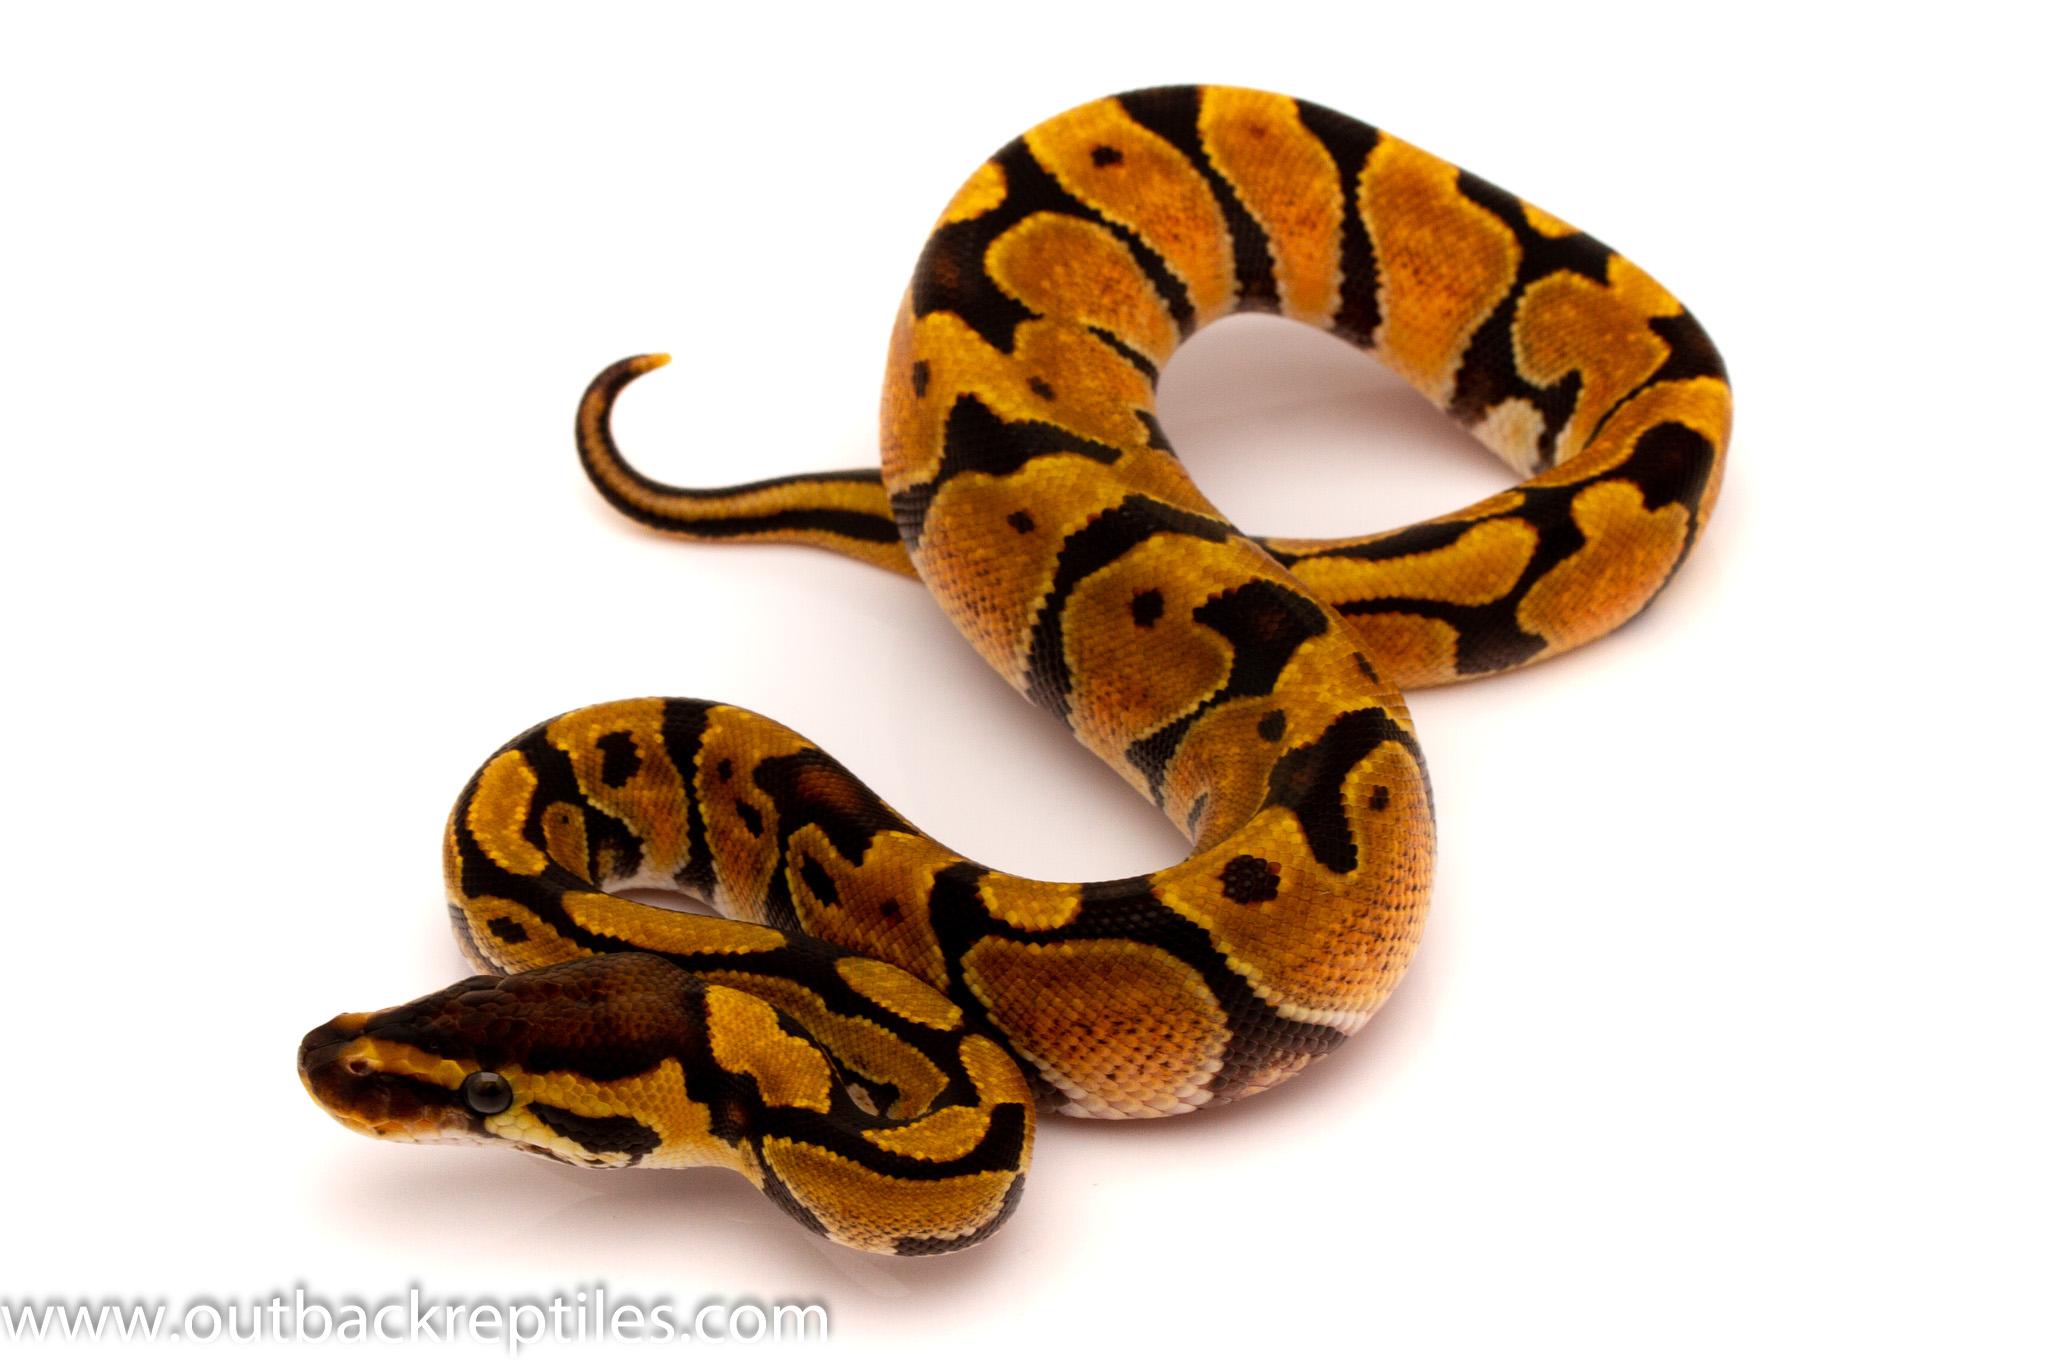 enchi female ball python for sale